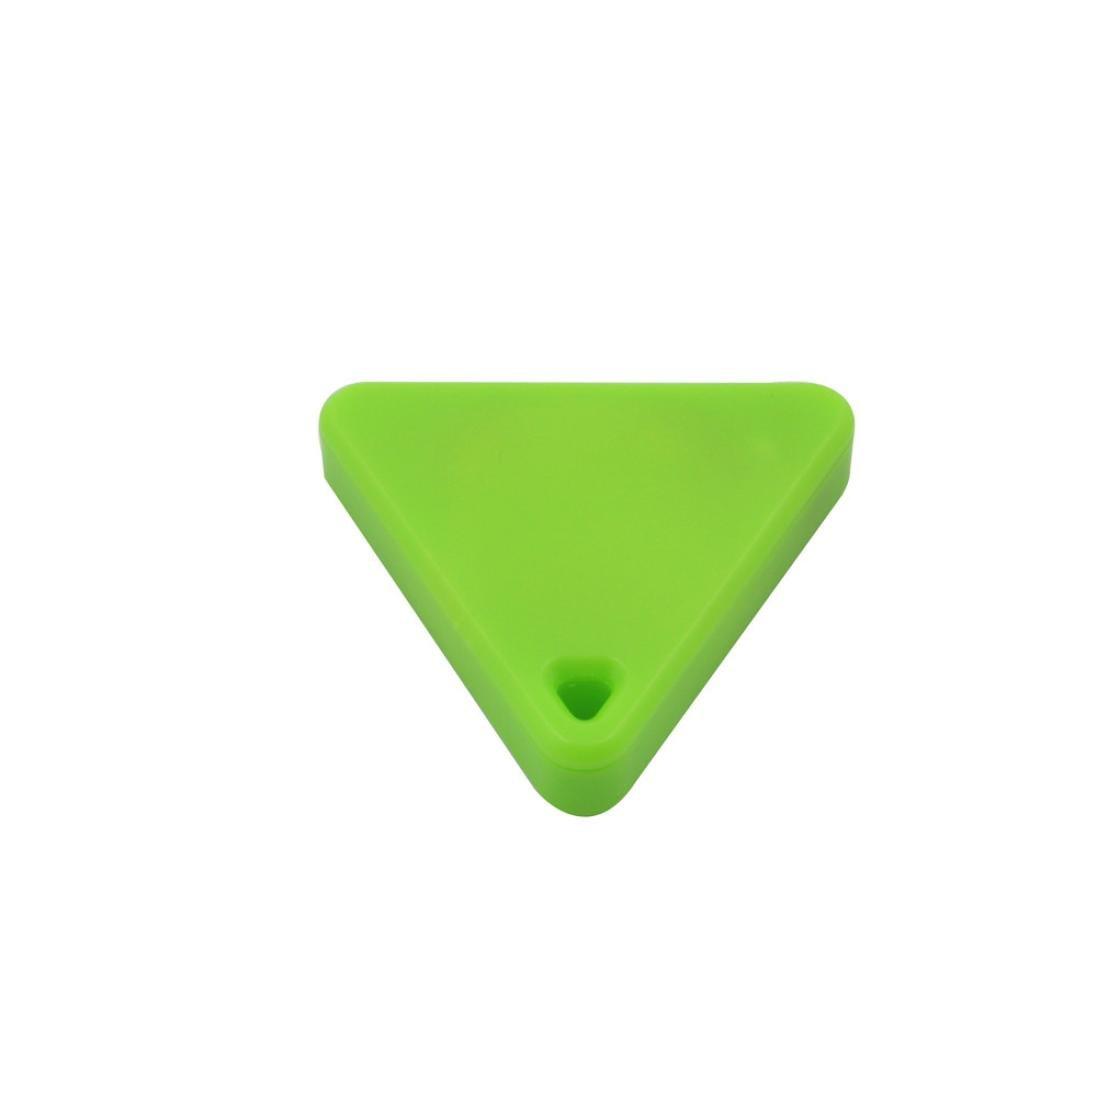 Gotd Bluetooth Mini GPS Tracker Locator Alarm Pet Child Wallet Key Finder (Green)